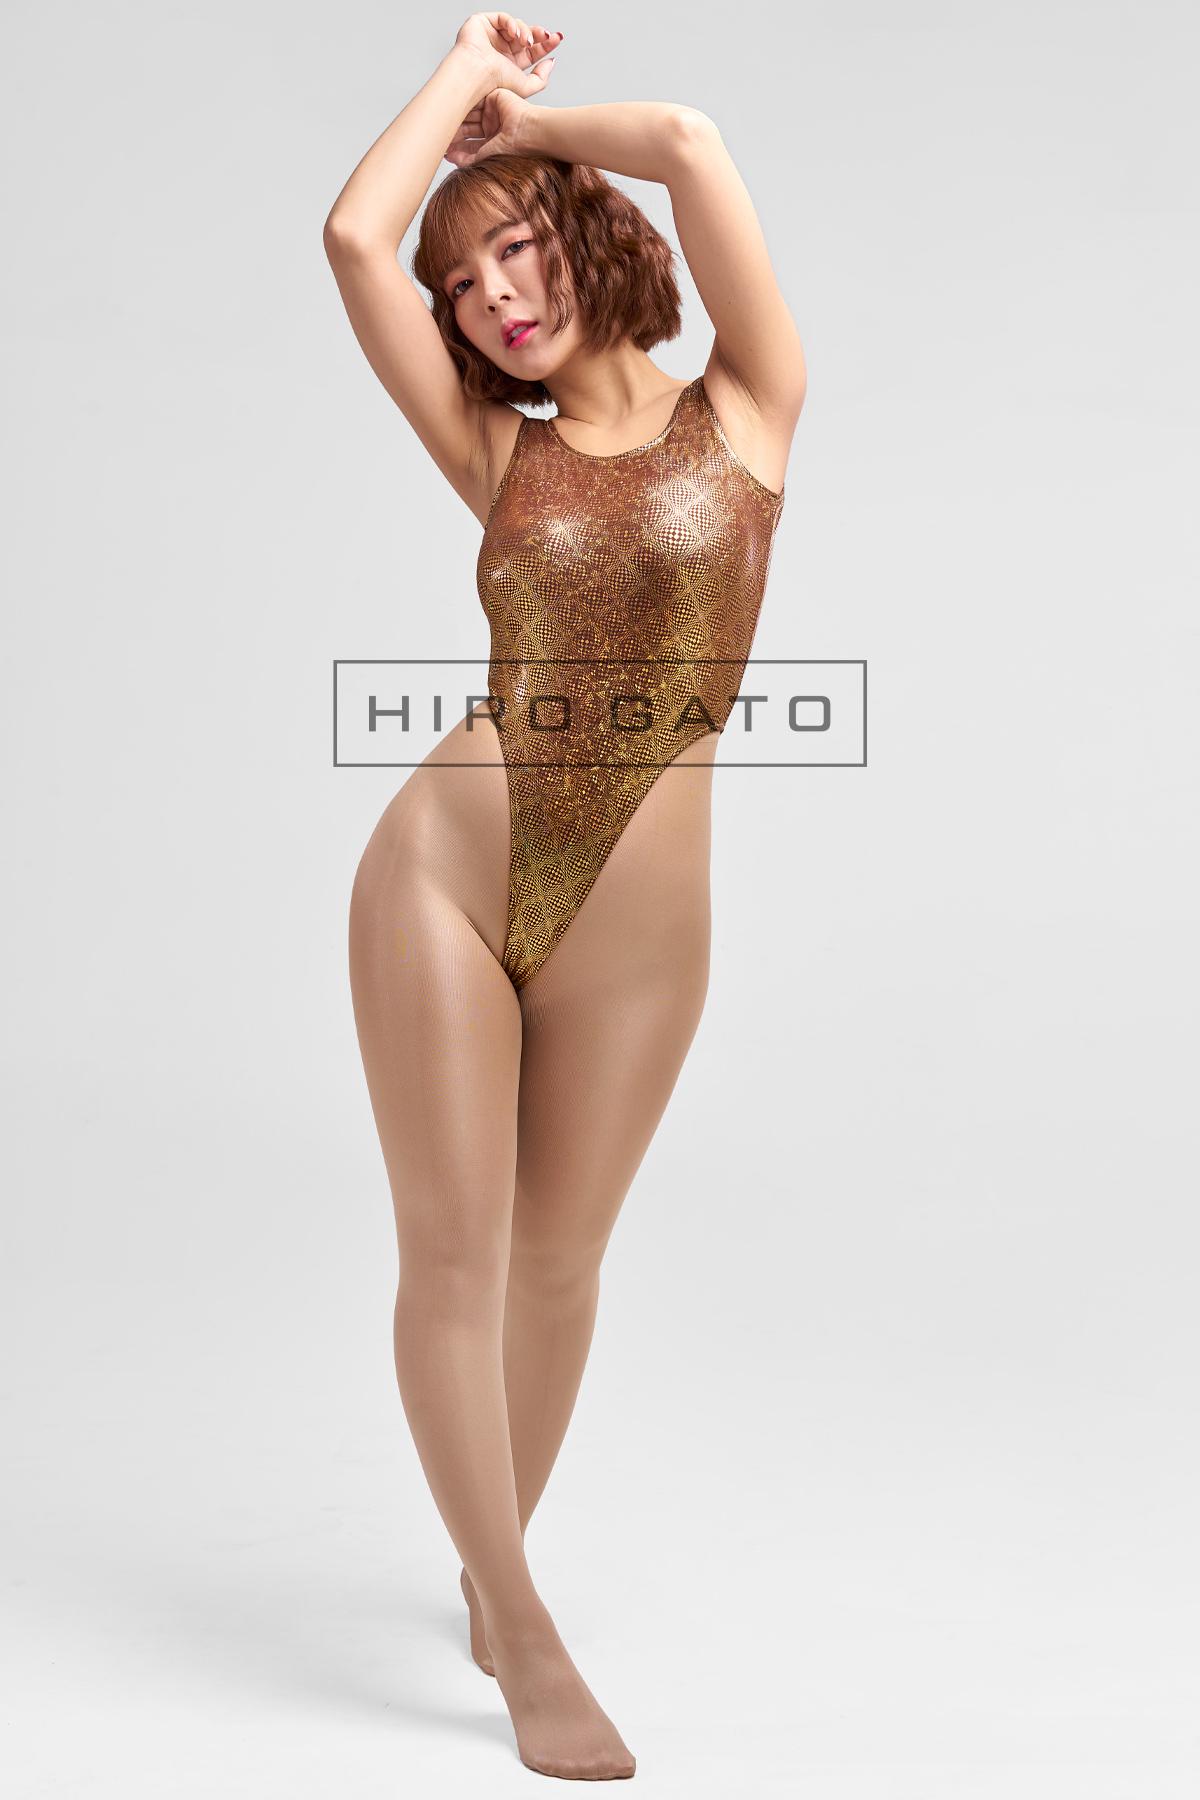 Shiny Disco Diamond Hologram Leotard Gold High Leg Spandex Lycra Body Swimsuit